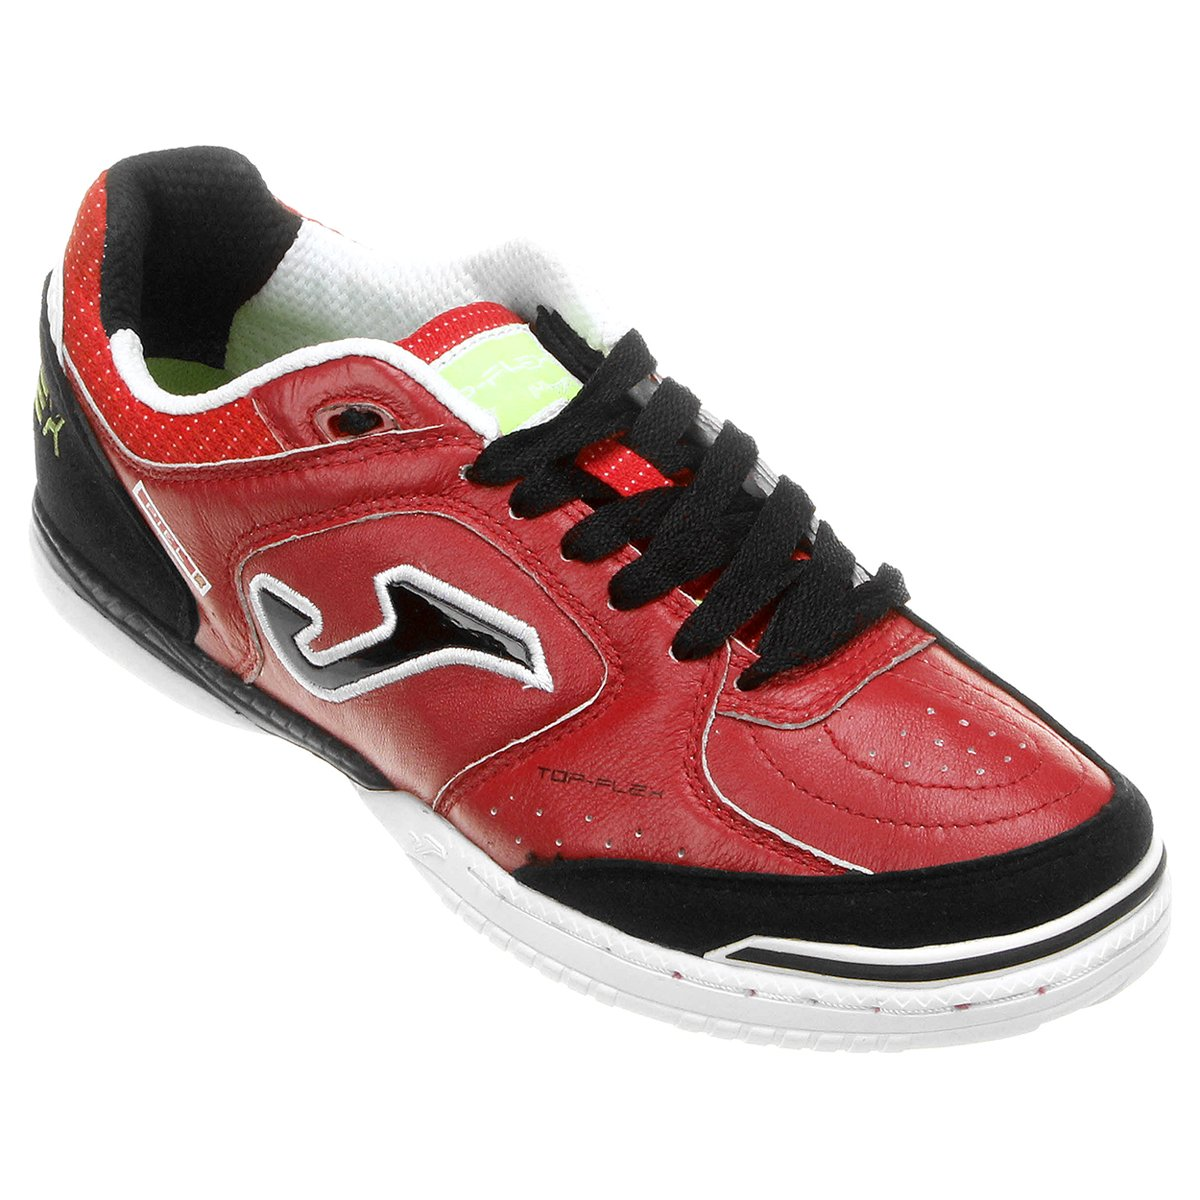 Chuteira Joma Top Flex Futsal - Compre Agora  442539a3aebbf